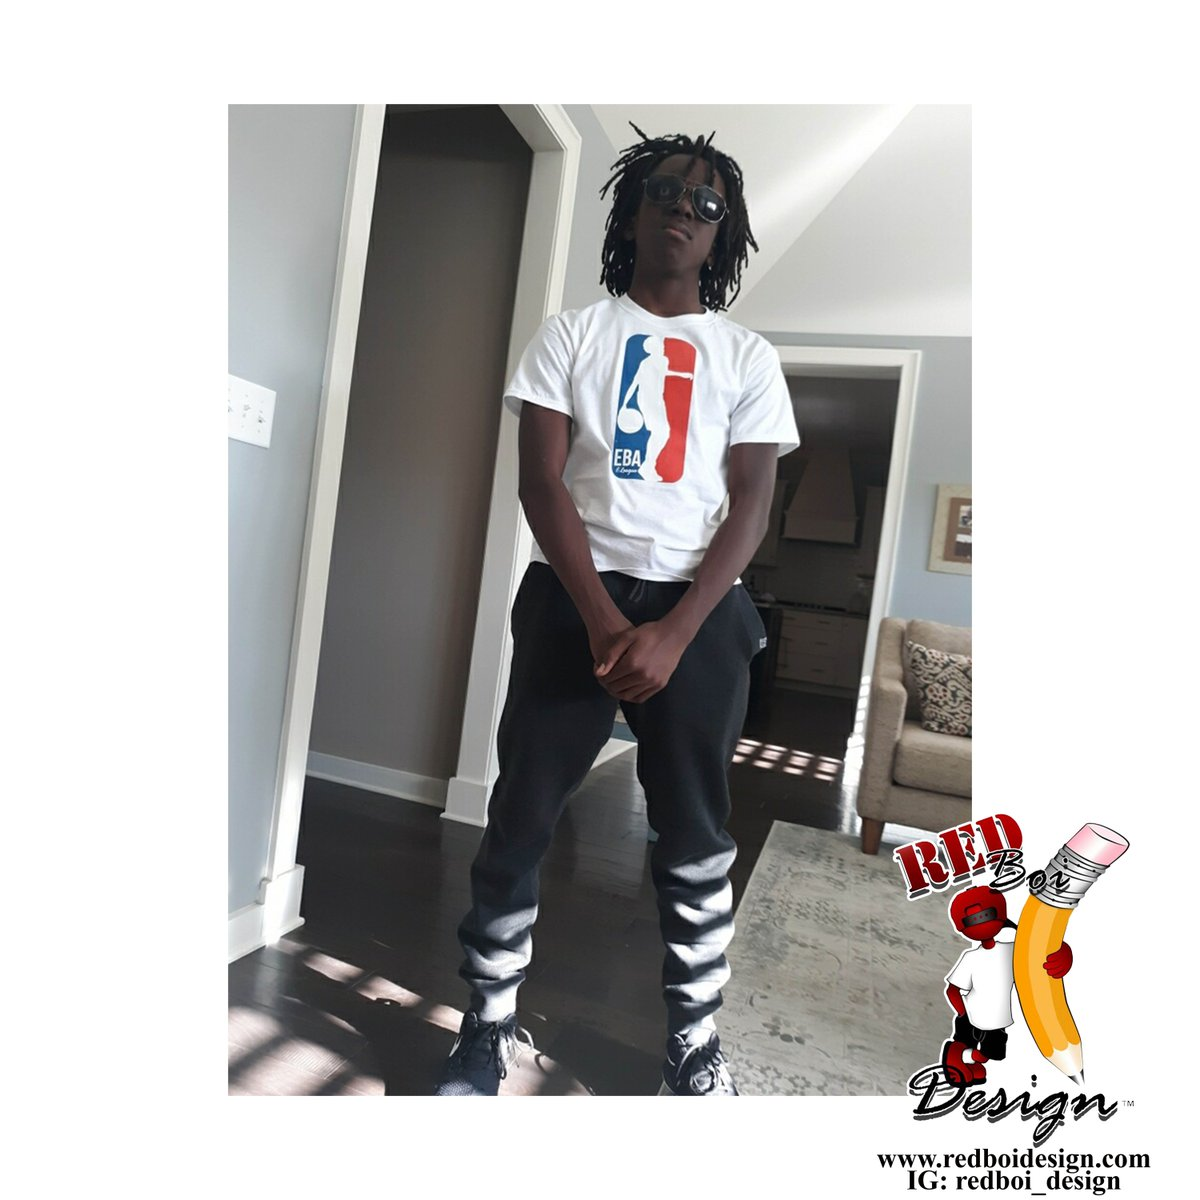 . . . . . #jumpshots #graphicclothings #basketballplayer #basketball #crossovers #digitalart #eleague #pointguards #jumpshot #style #redboidesign #basketballneverstops #graphicartists #crossover #graphictshirtshop #customtees #pointguard #tshirtsupremepic.twitter.com/bpwClXetAt